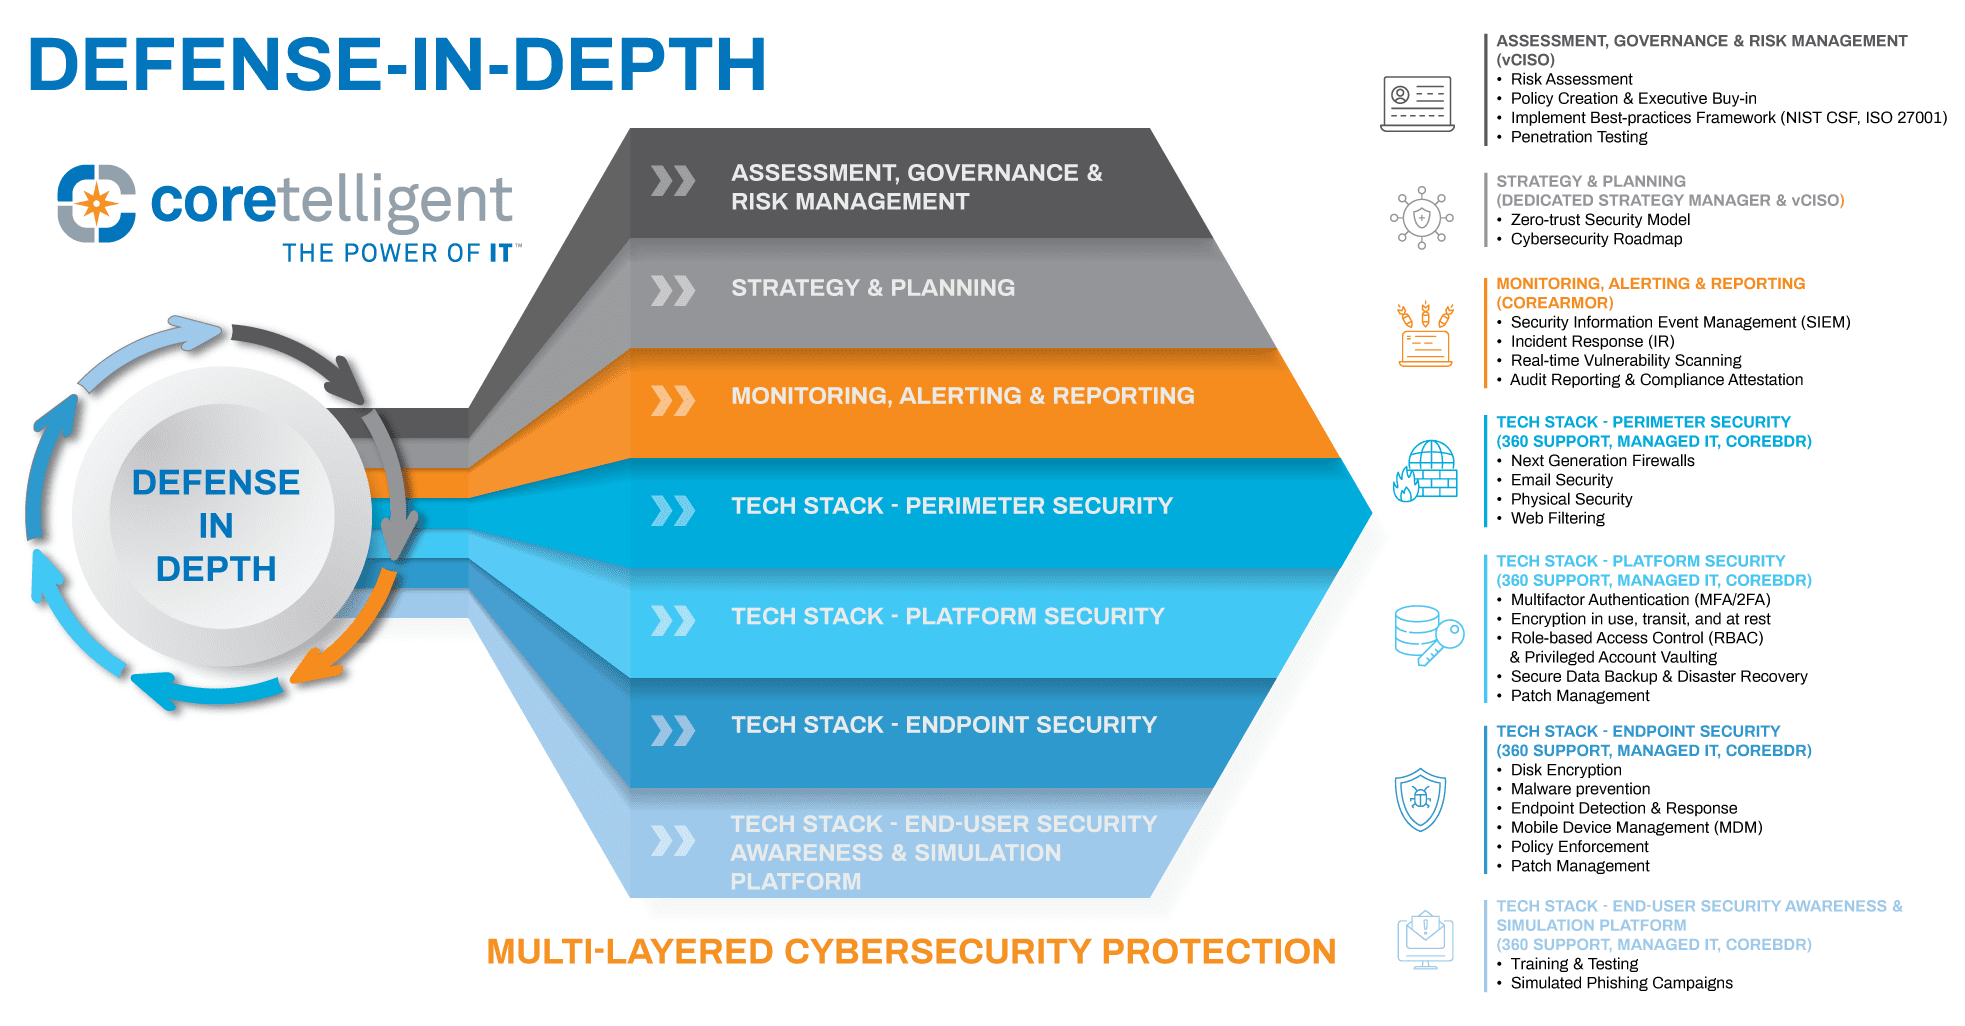 Defense-in-depth Multi-layered Cybersecurity